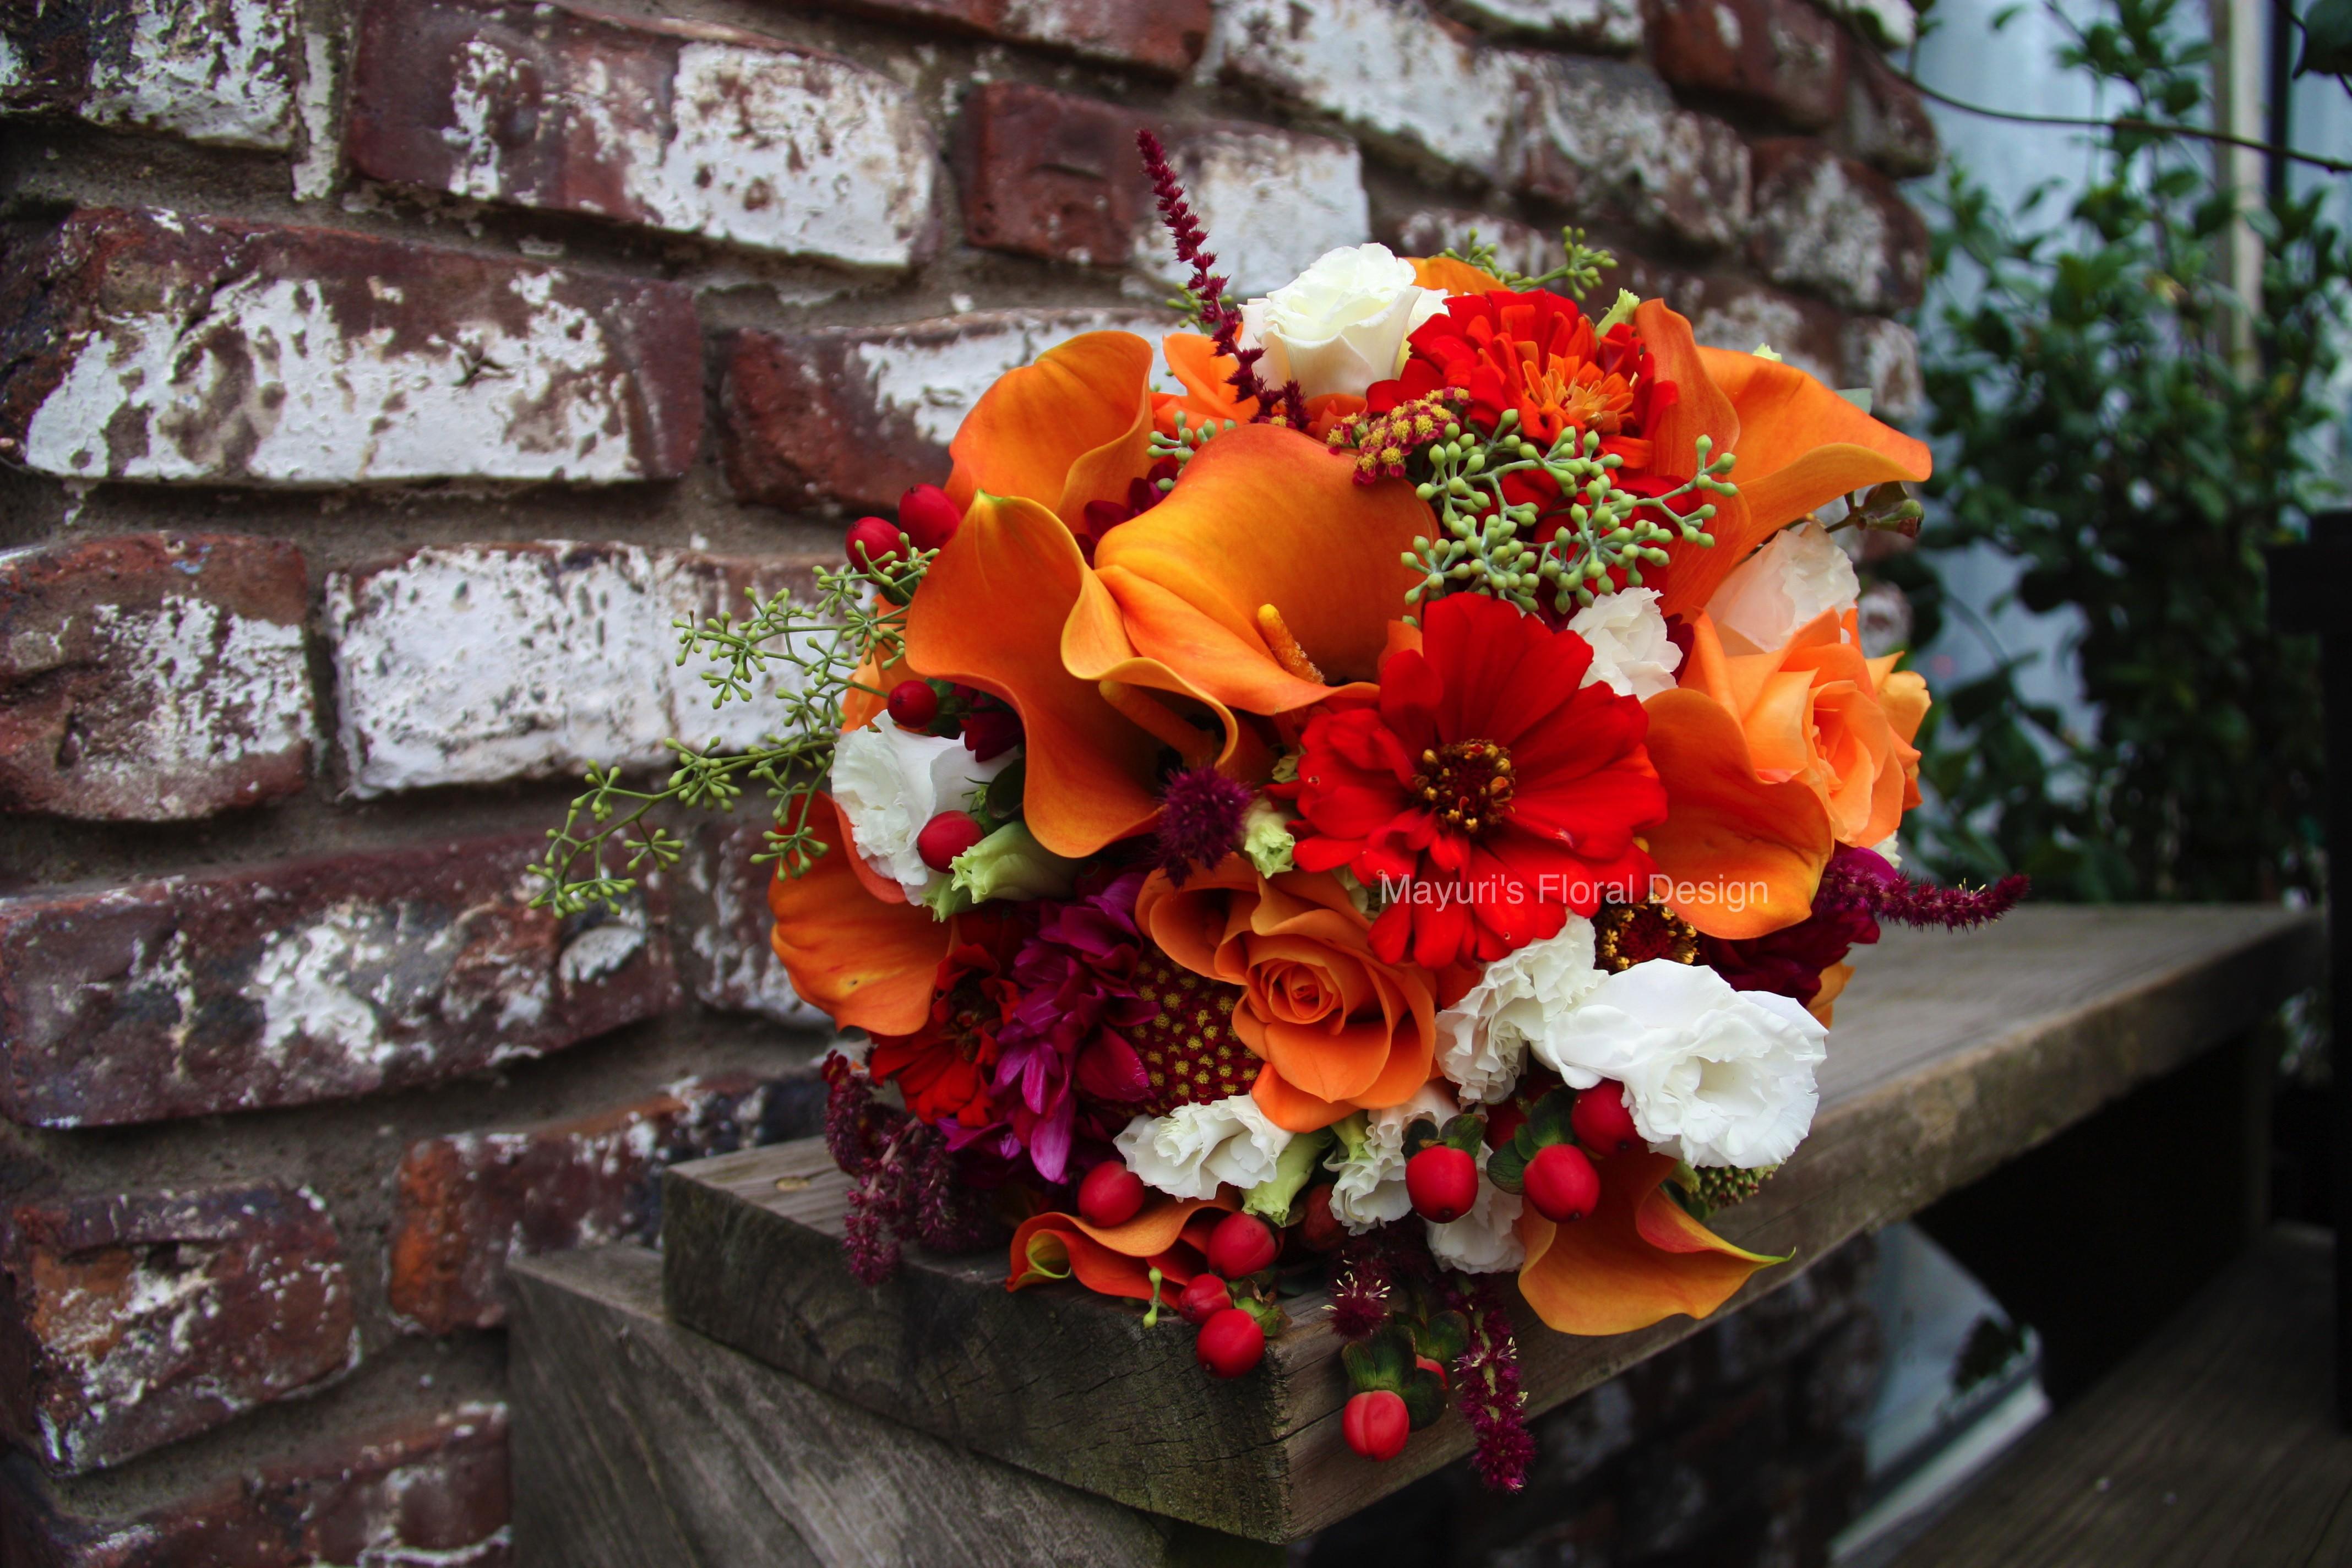 Mayuri S Floral Design Linkedin